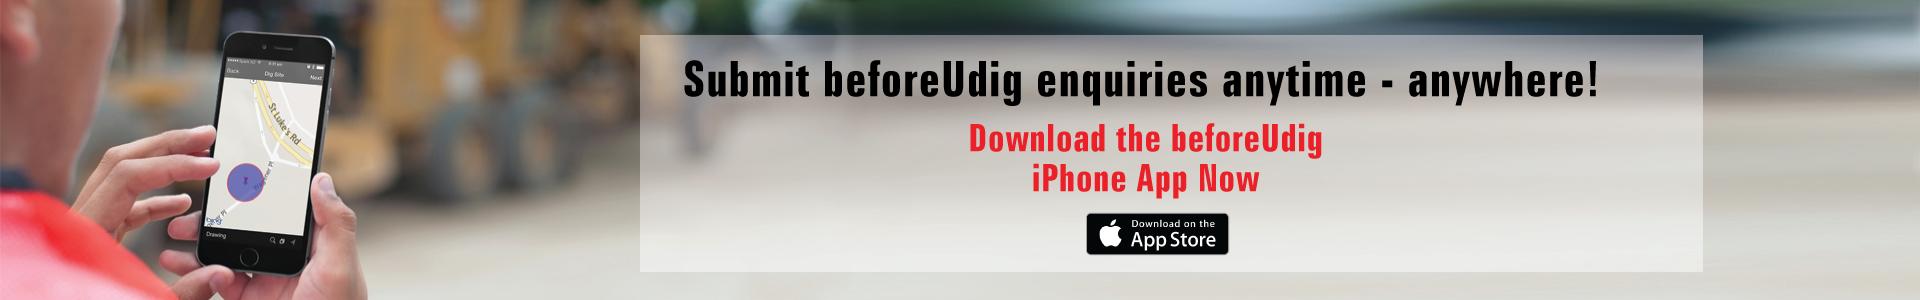 bud nz iphone app